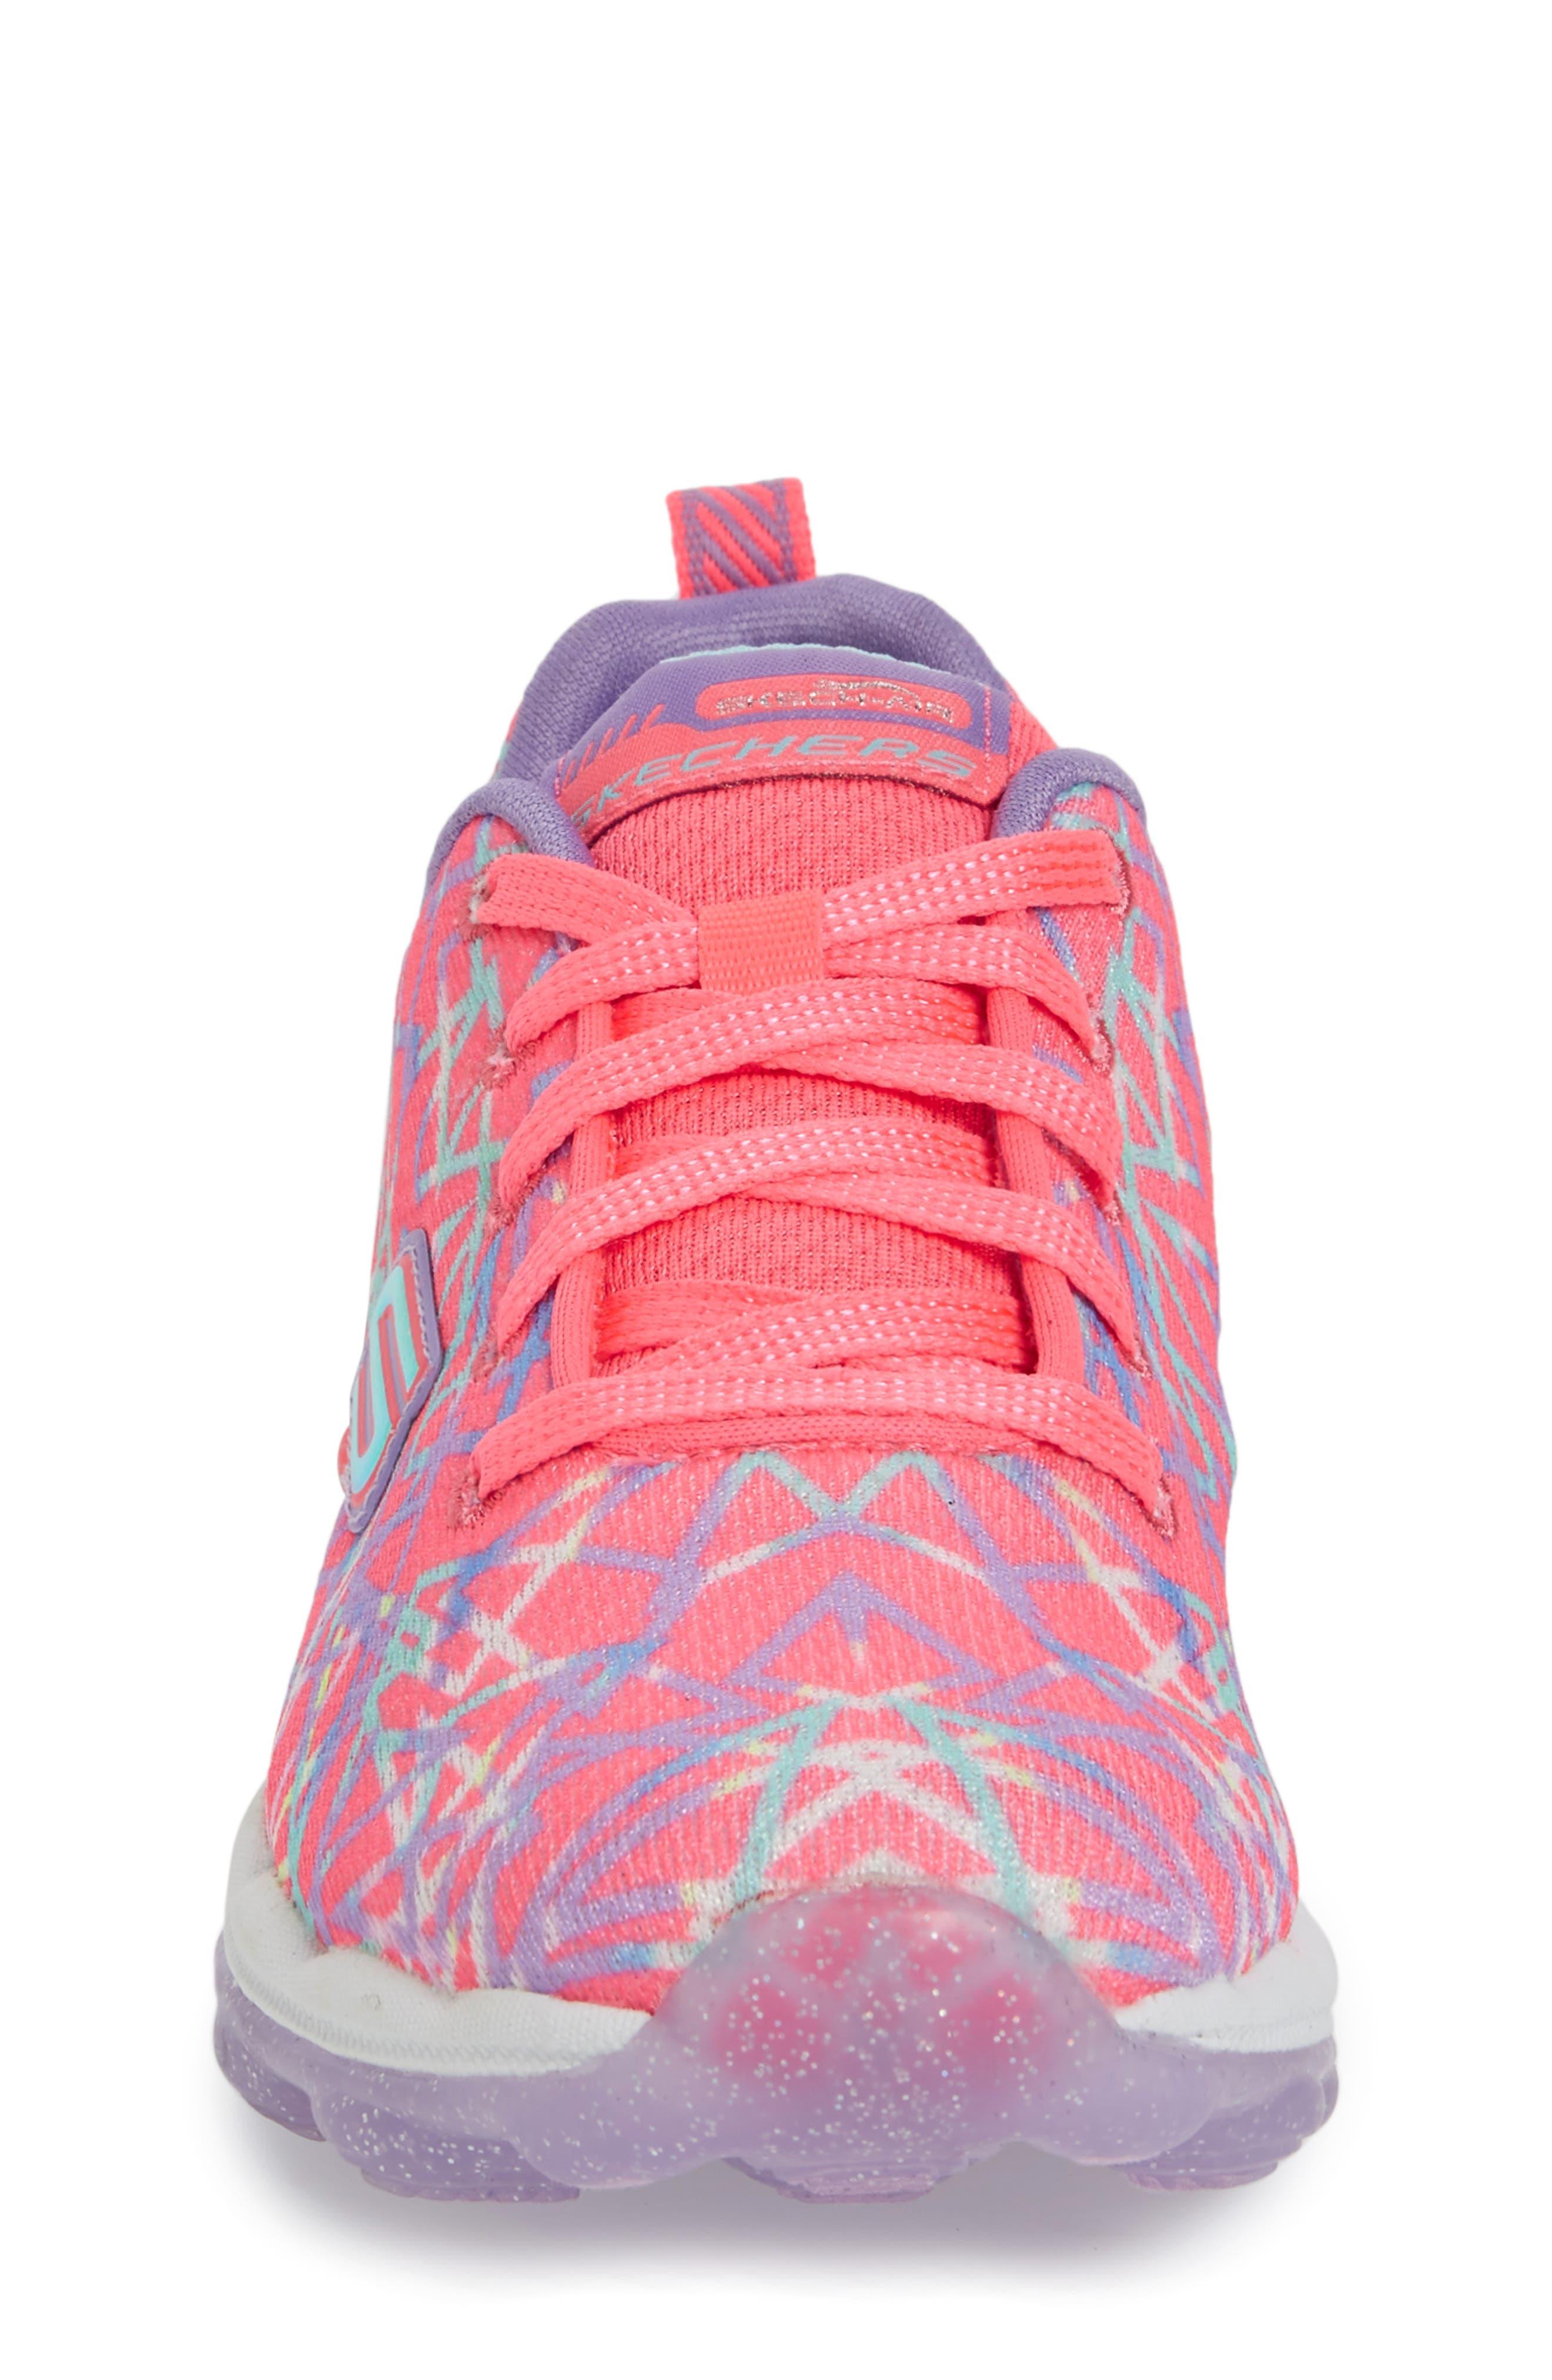 Skech-Air Sneaker,                             Alternate thumbnail 4, color,                             650